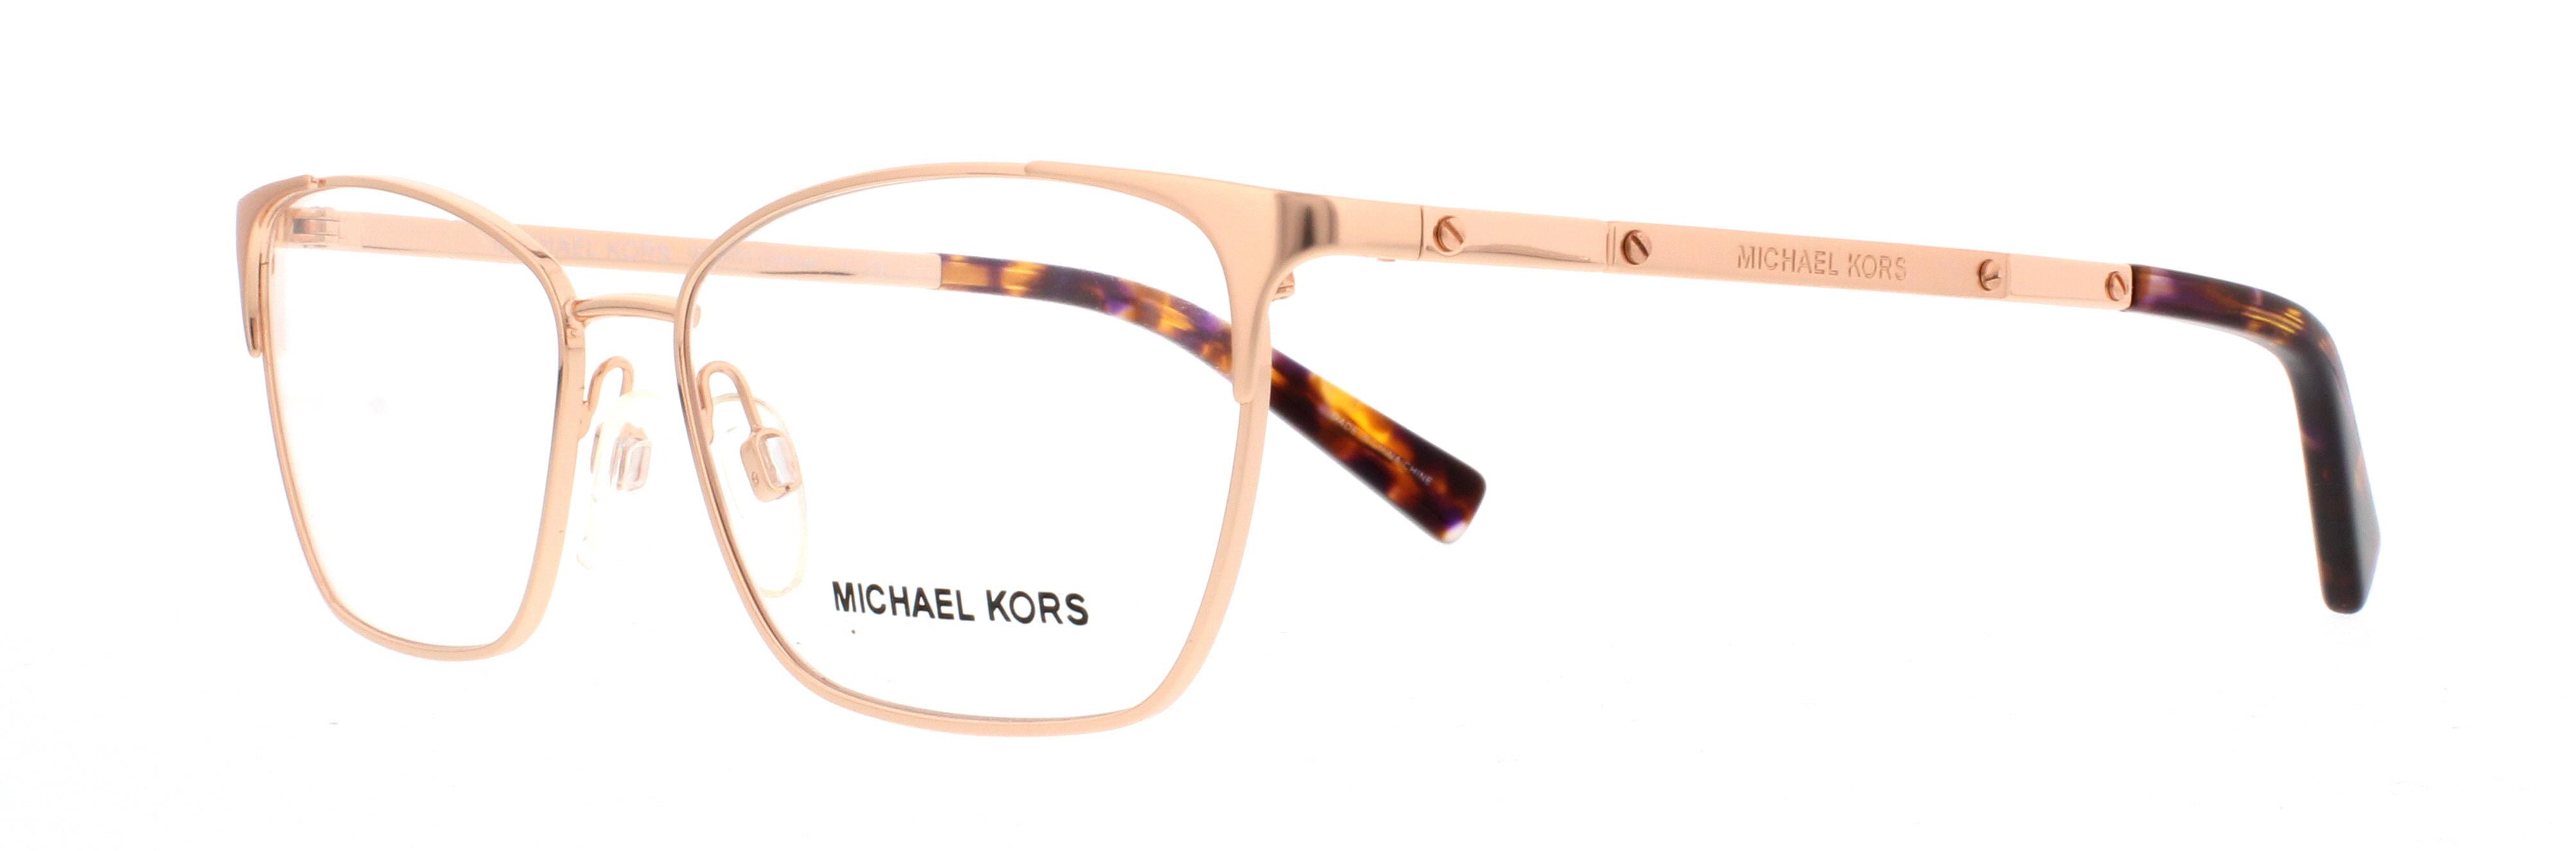 Michael Kors Eyewear Collection Mkdiscount